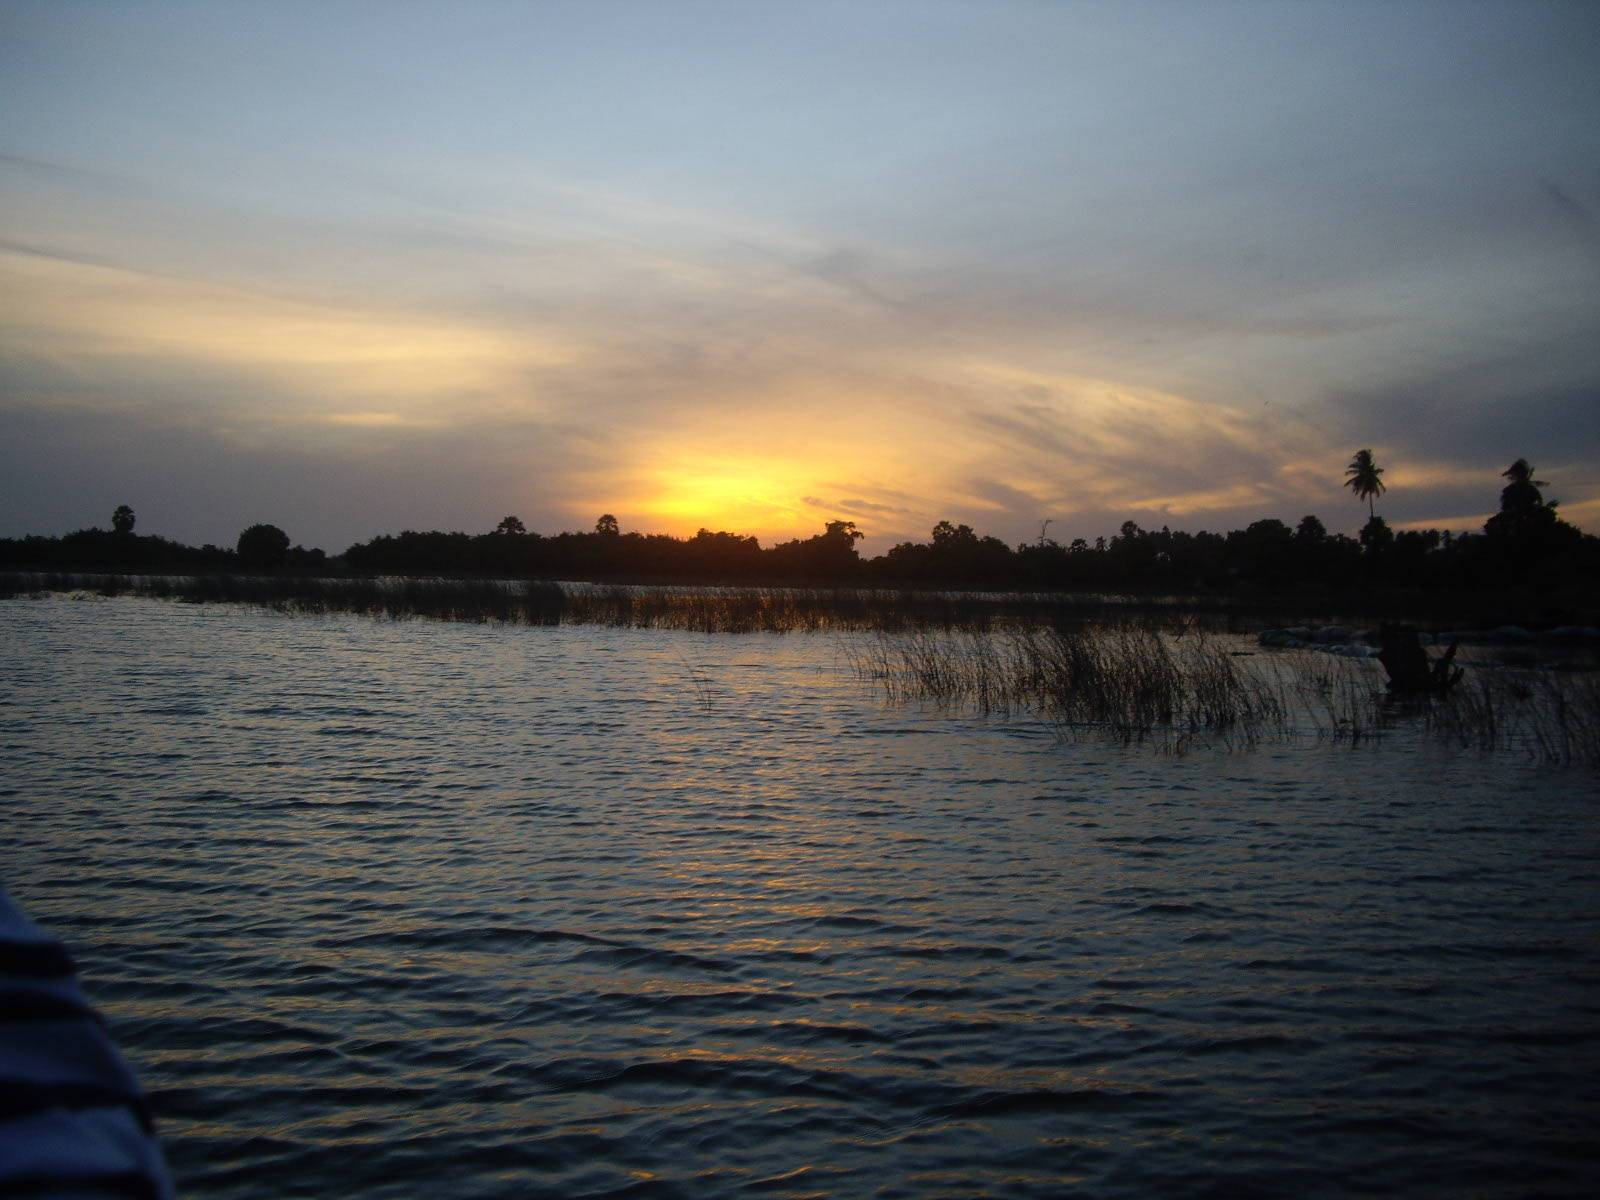 Photo 1: Un ballade dans la Mangrove